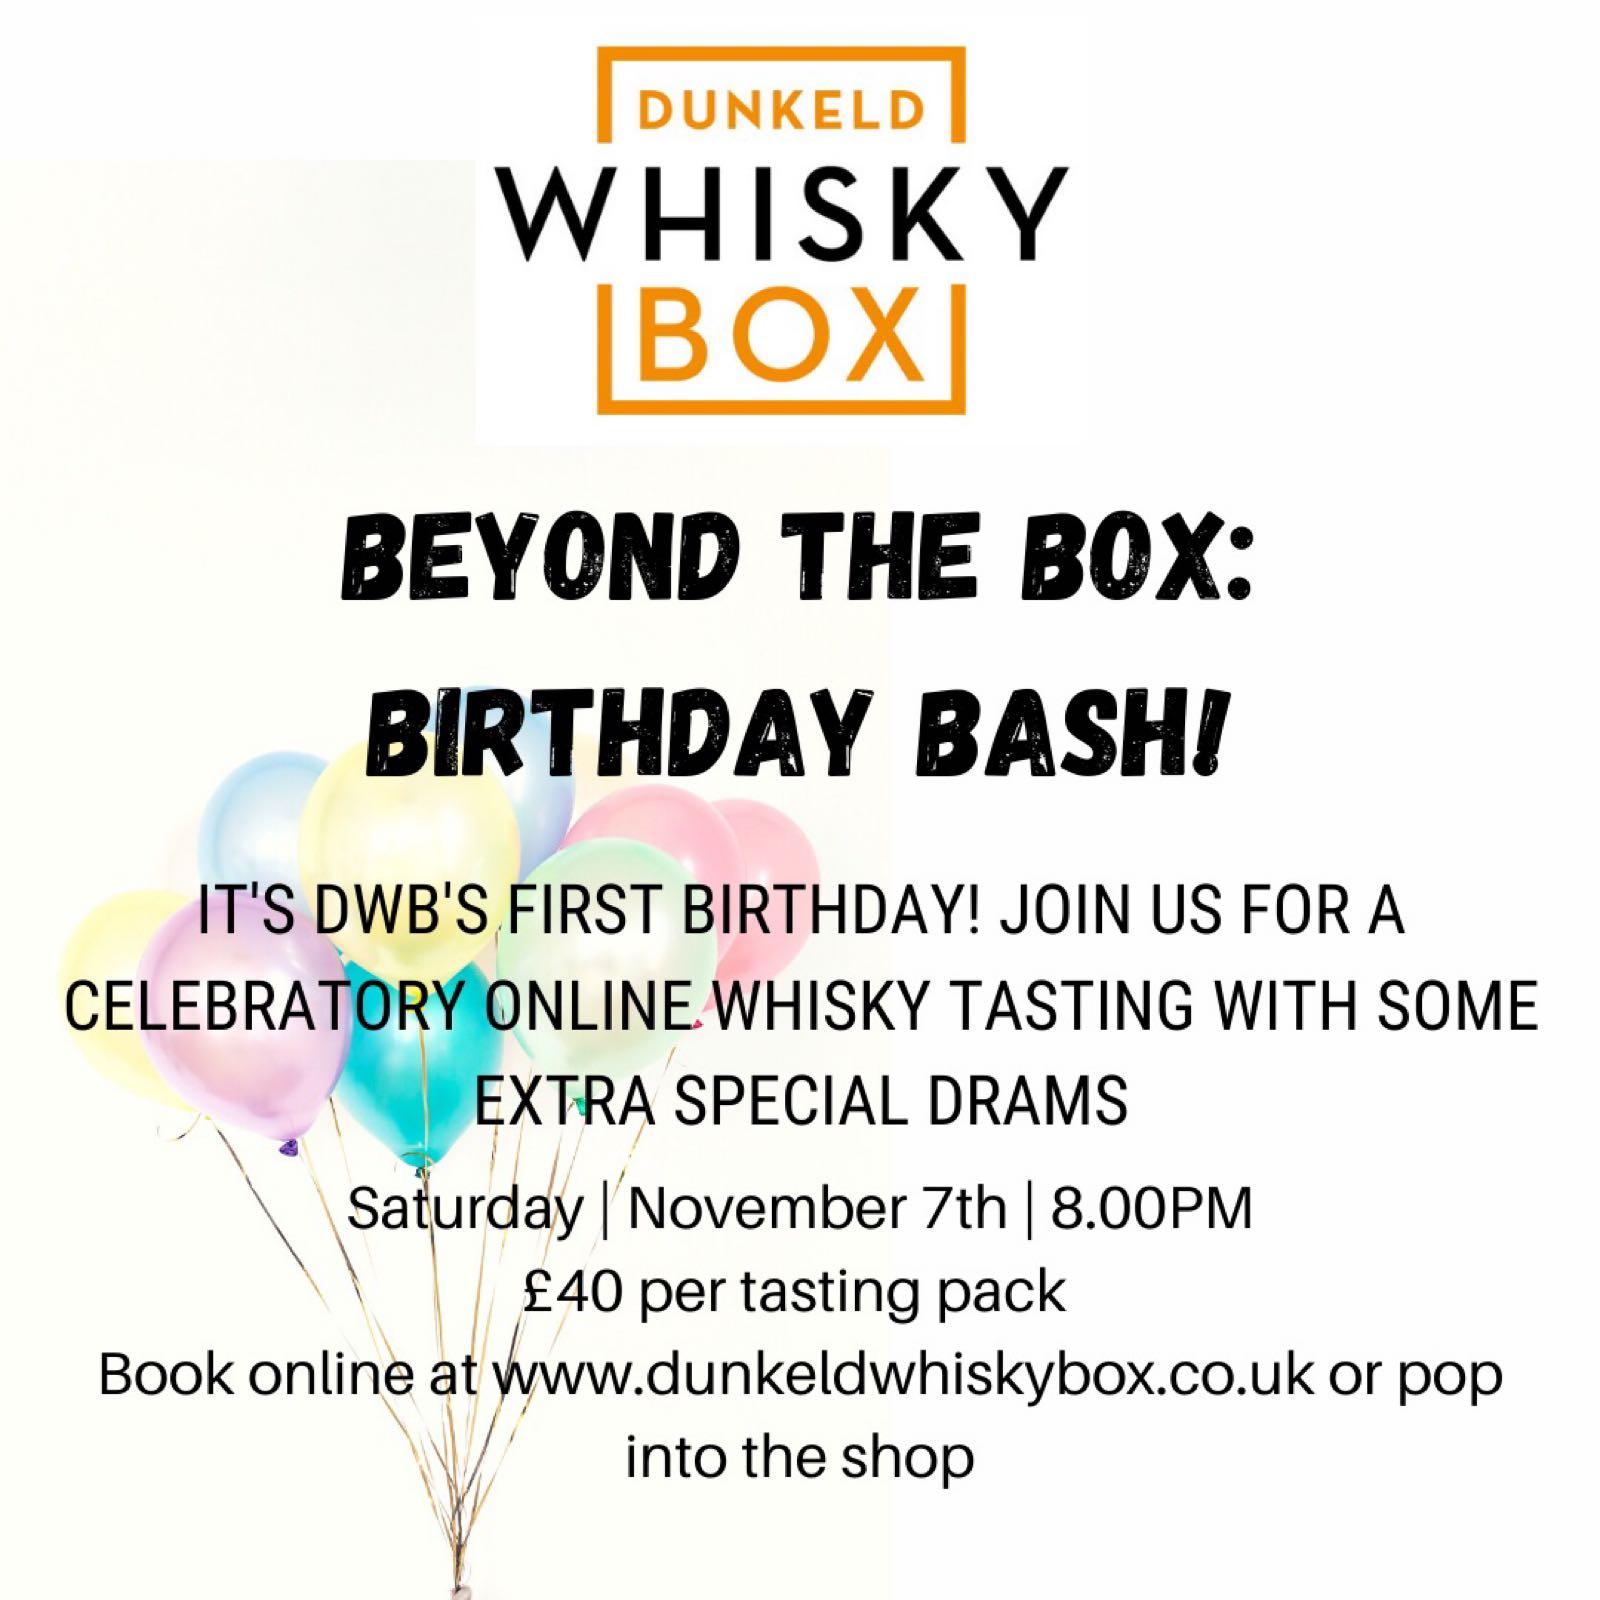 Beyond the Box: Birthday Bash